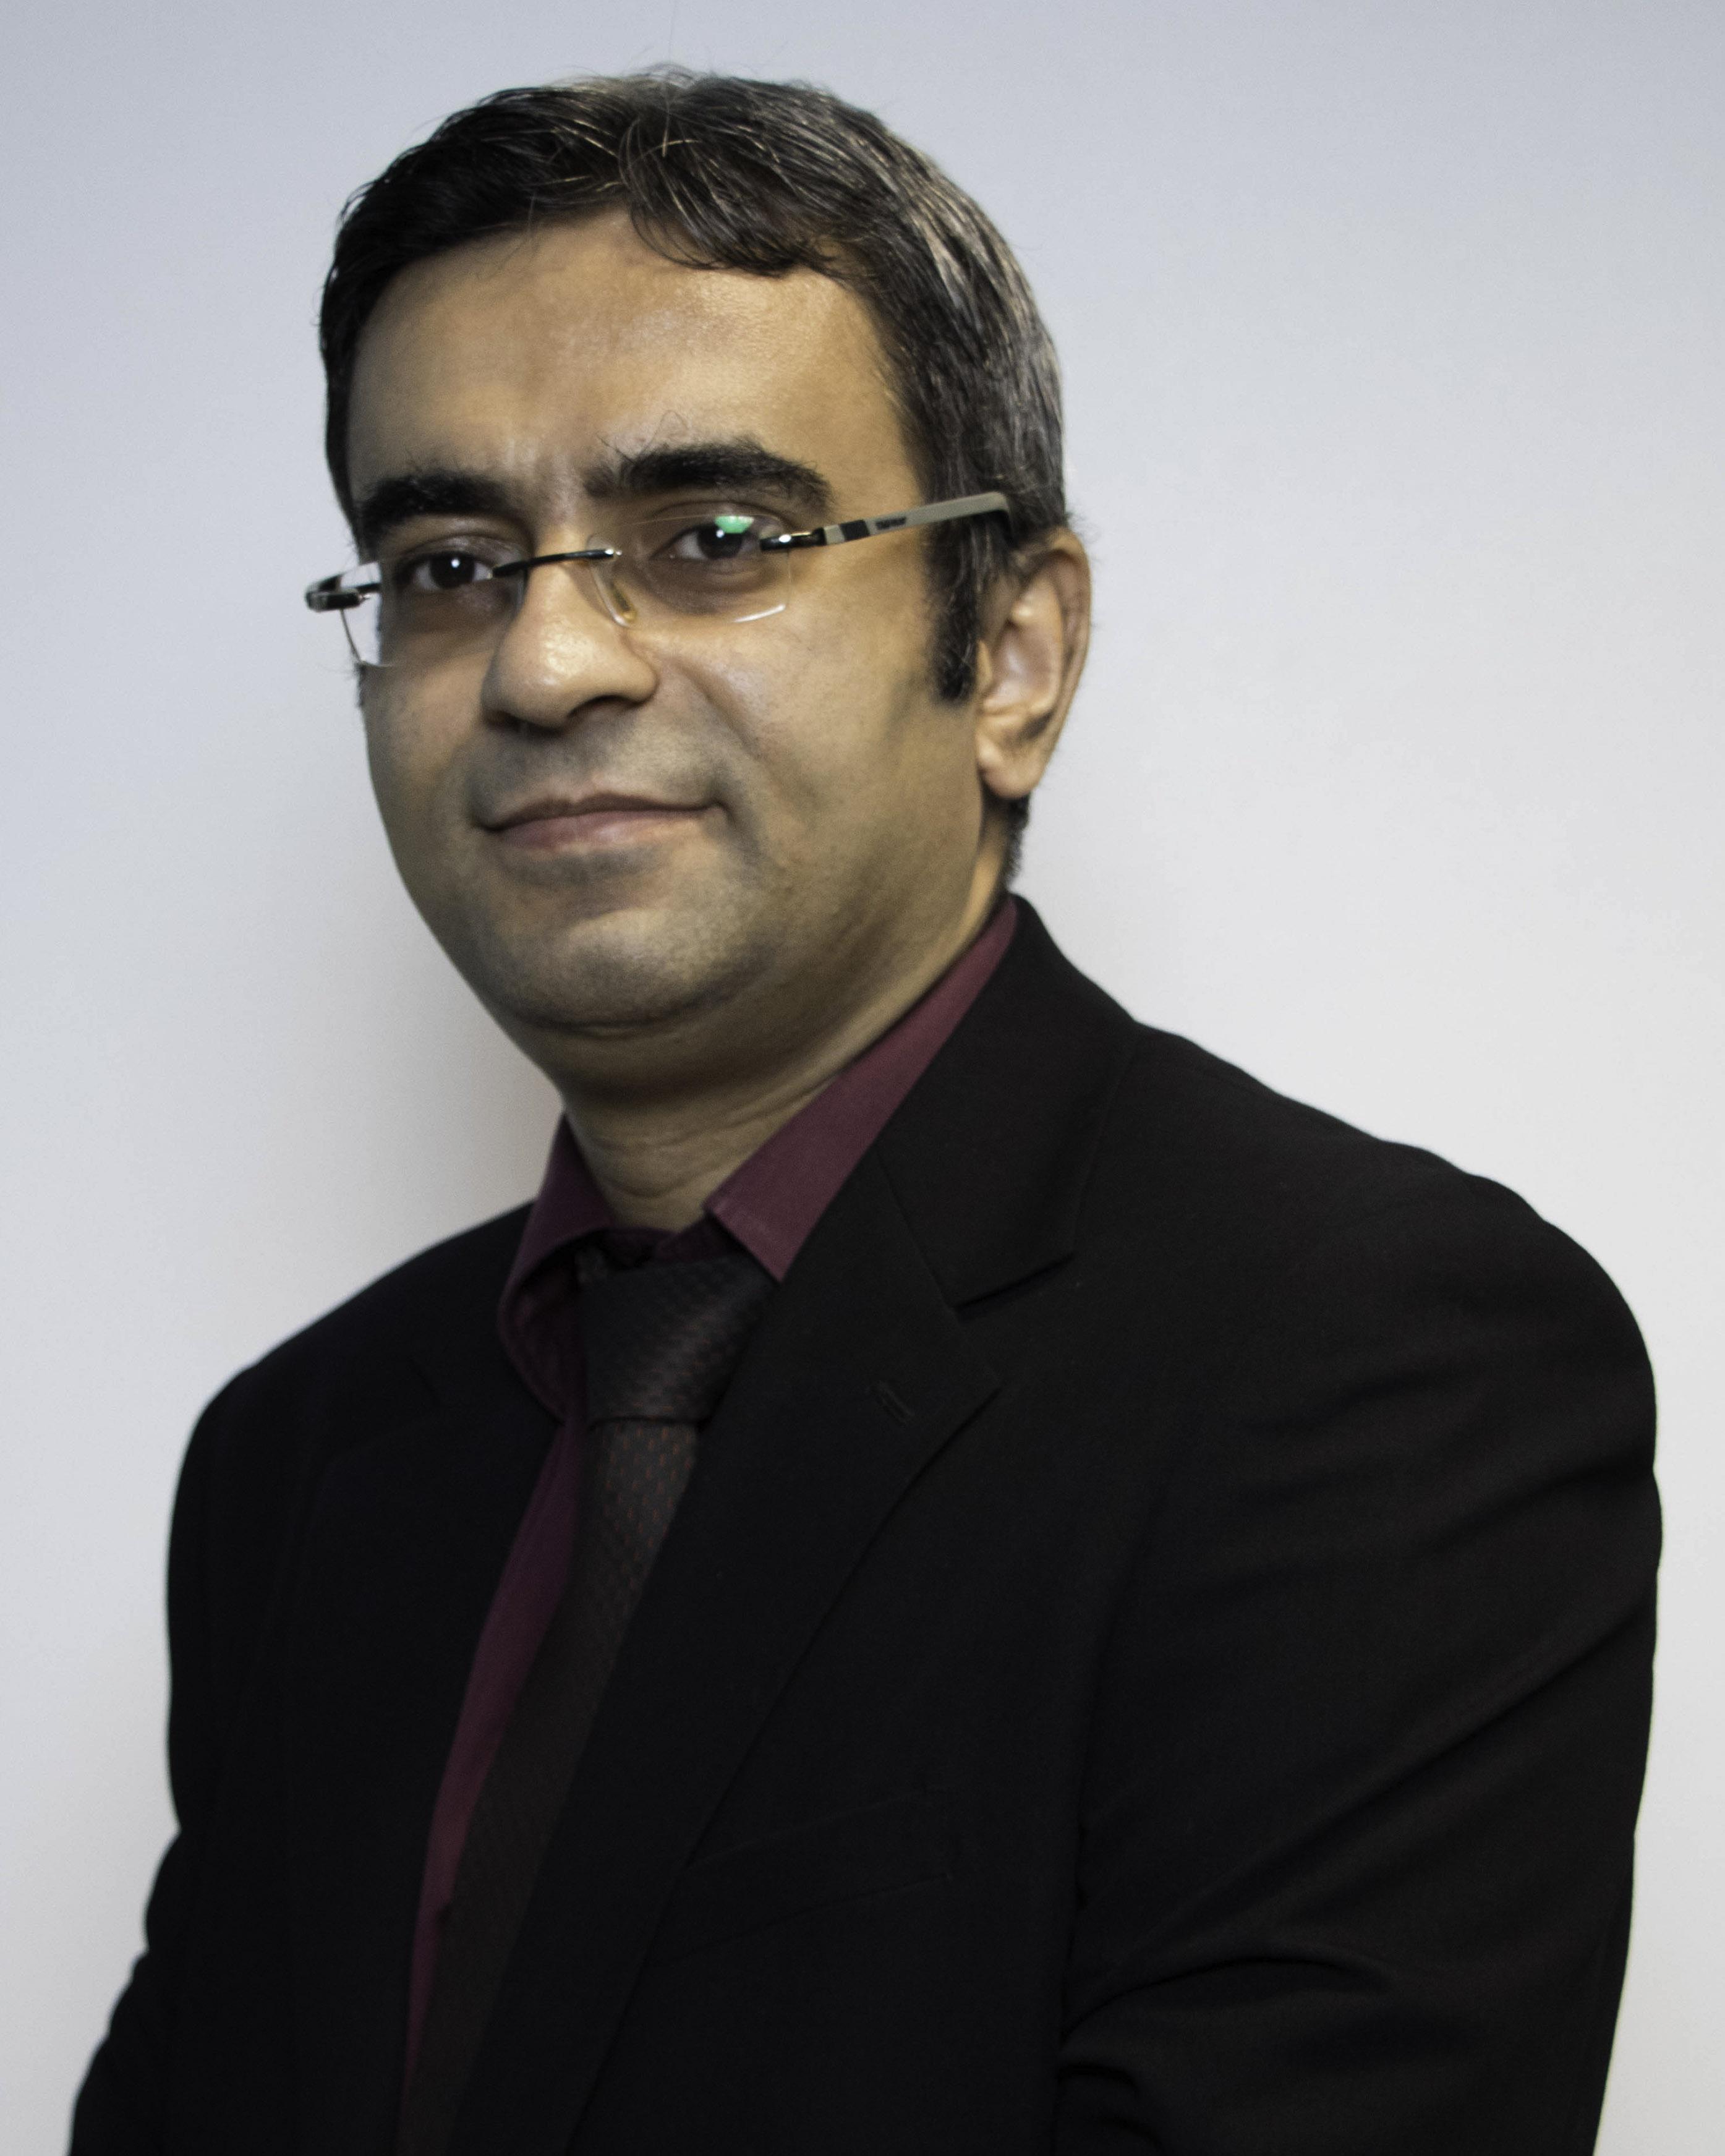 Amad Arshad